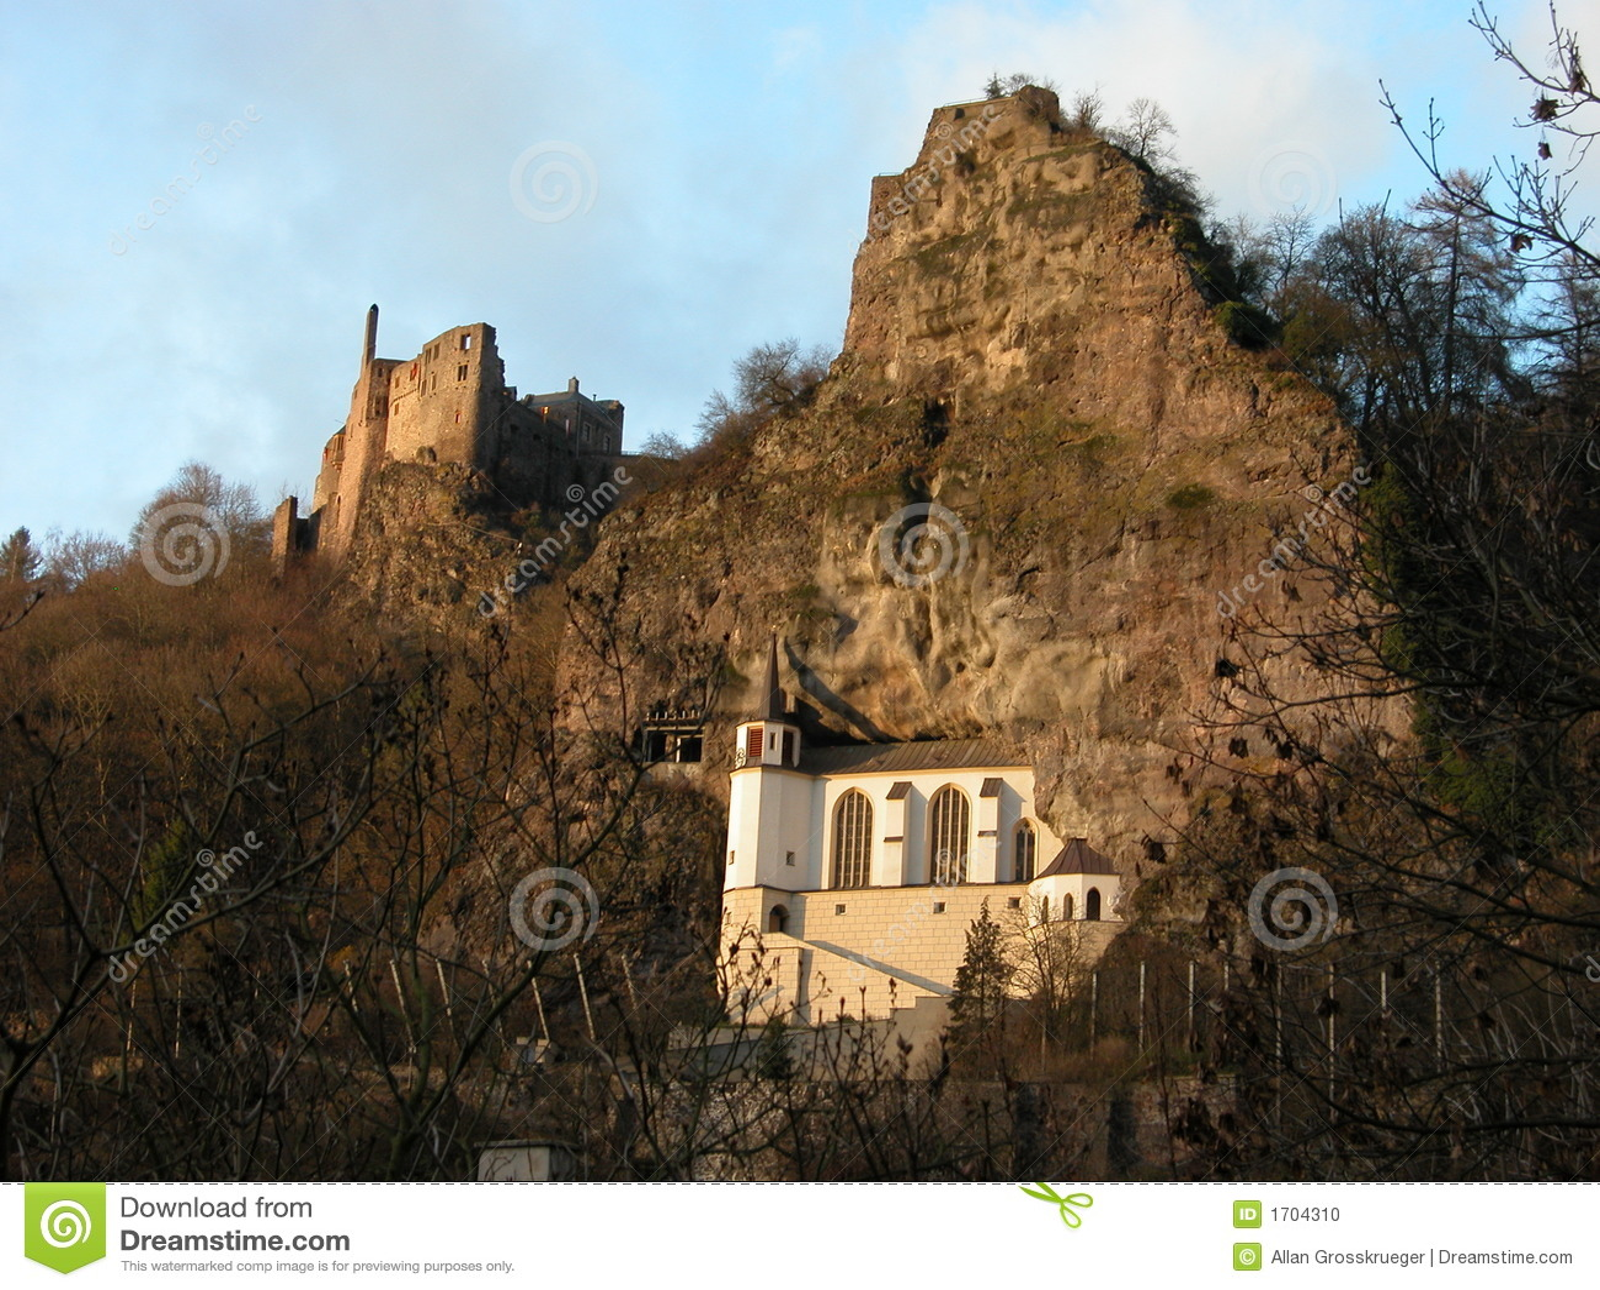 German The rock